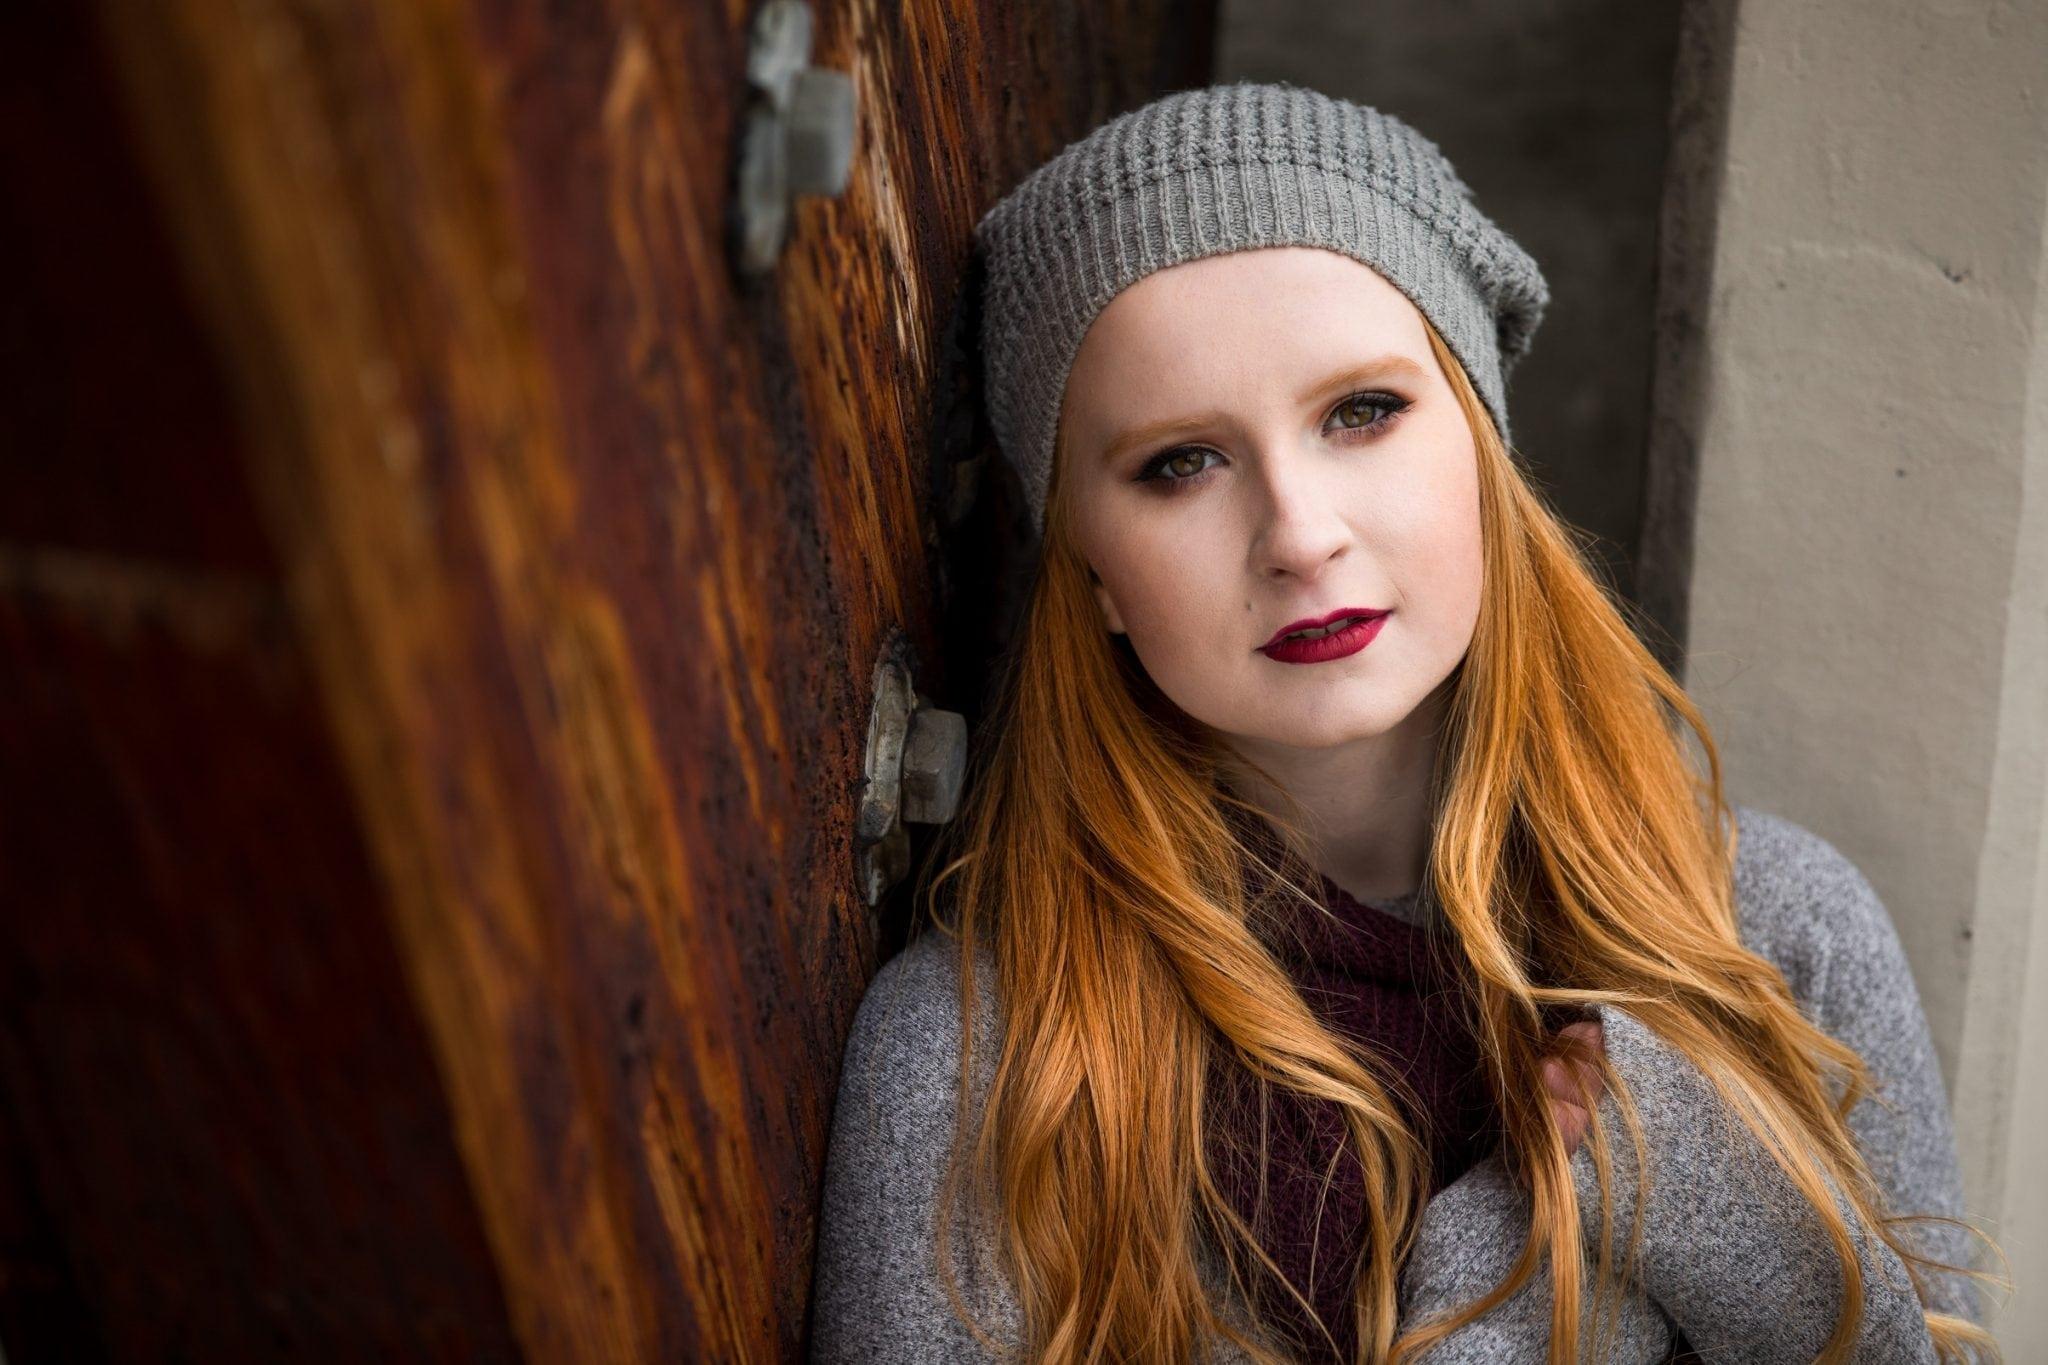 Senior photo of high school girl